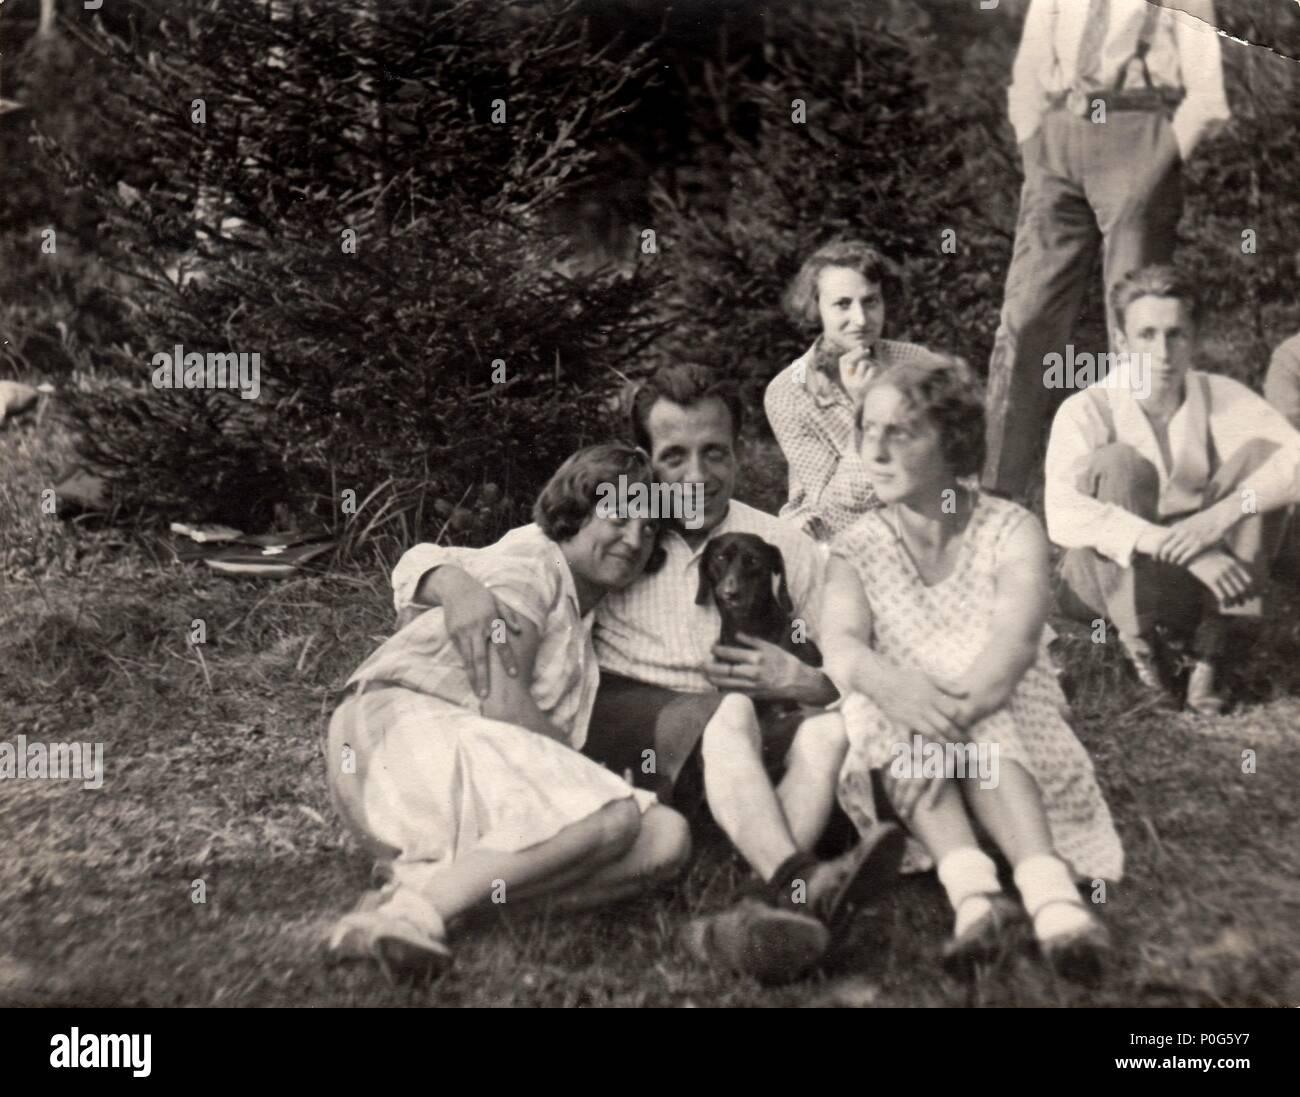 HODONIN, THE CZECHOSLOVAK REPUBLIC, CIRCA 1940: Retro photo shows a young boy with girls. Vintage photo, circa 1940. - Stock Image